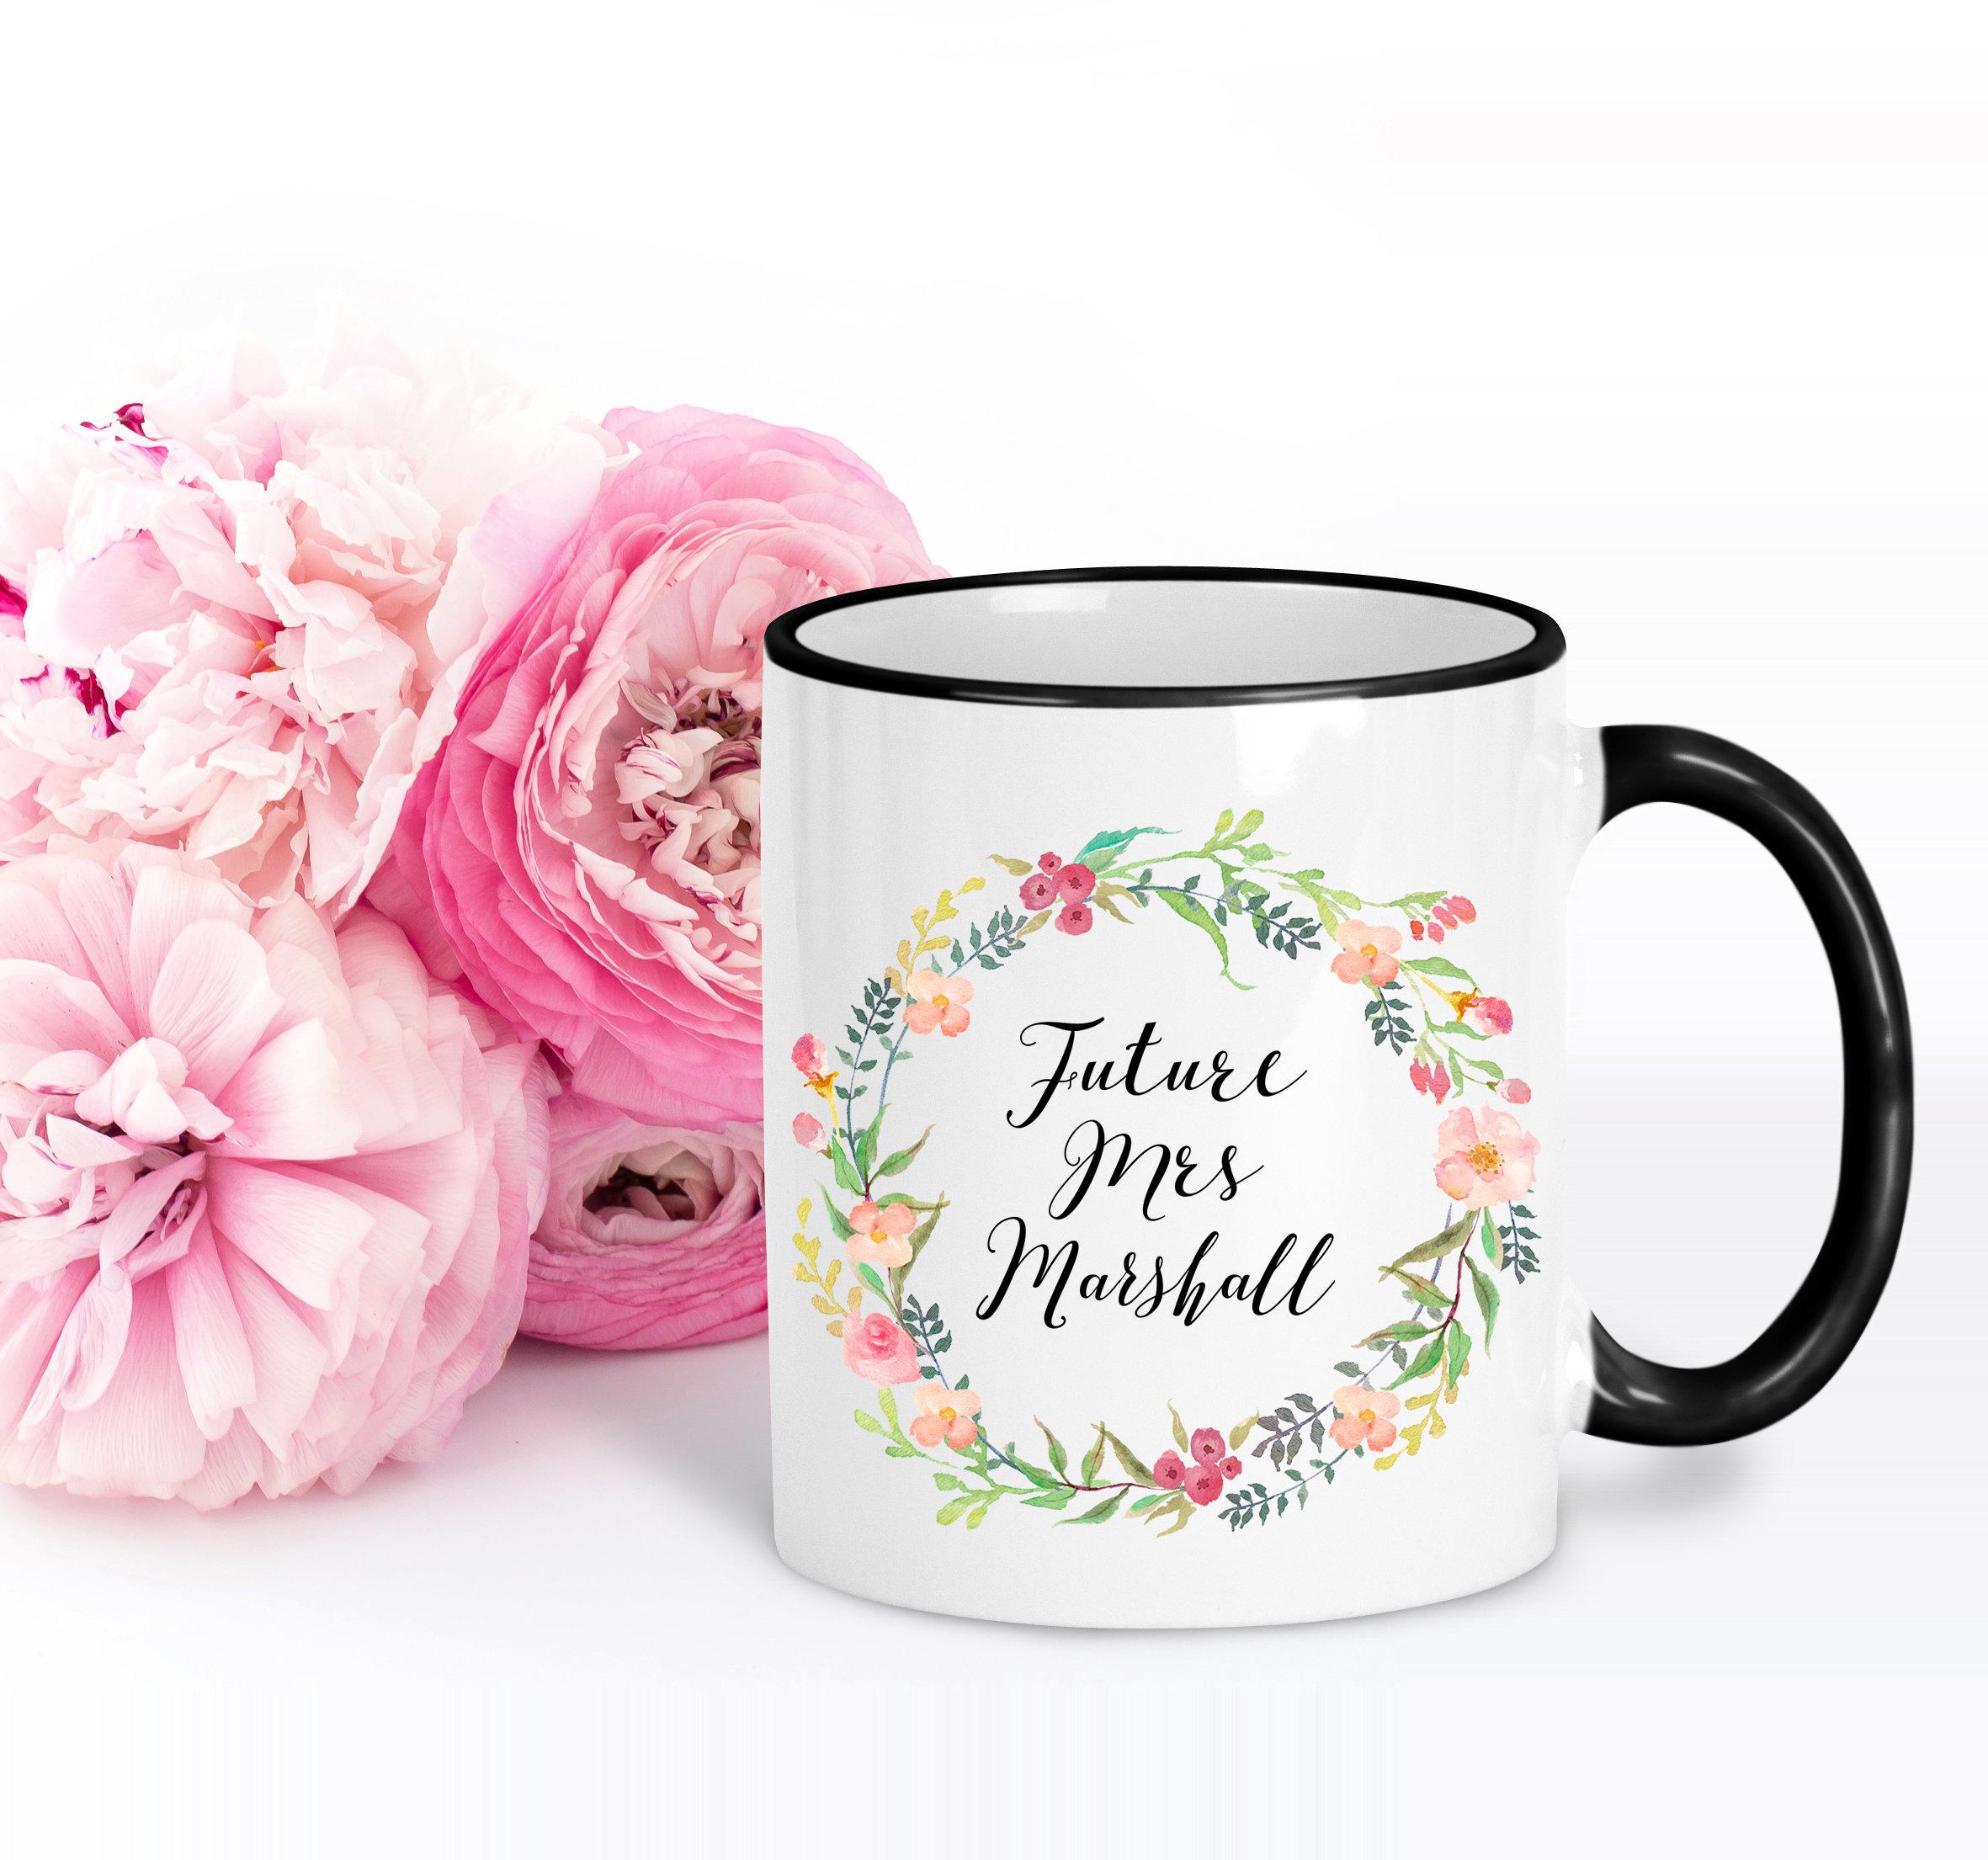 Floral Gift for Bride Future Mrs Mug Engagement Gift